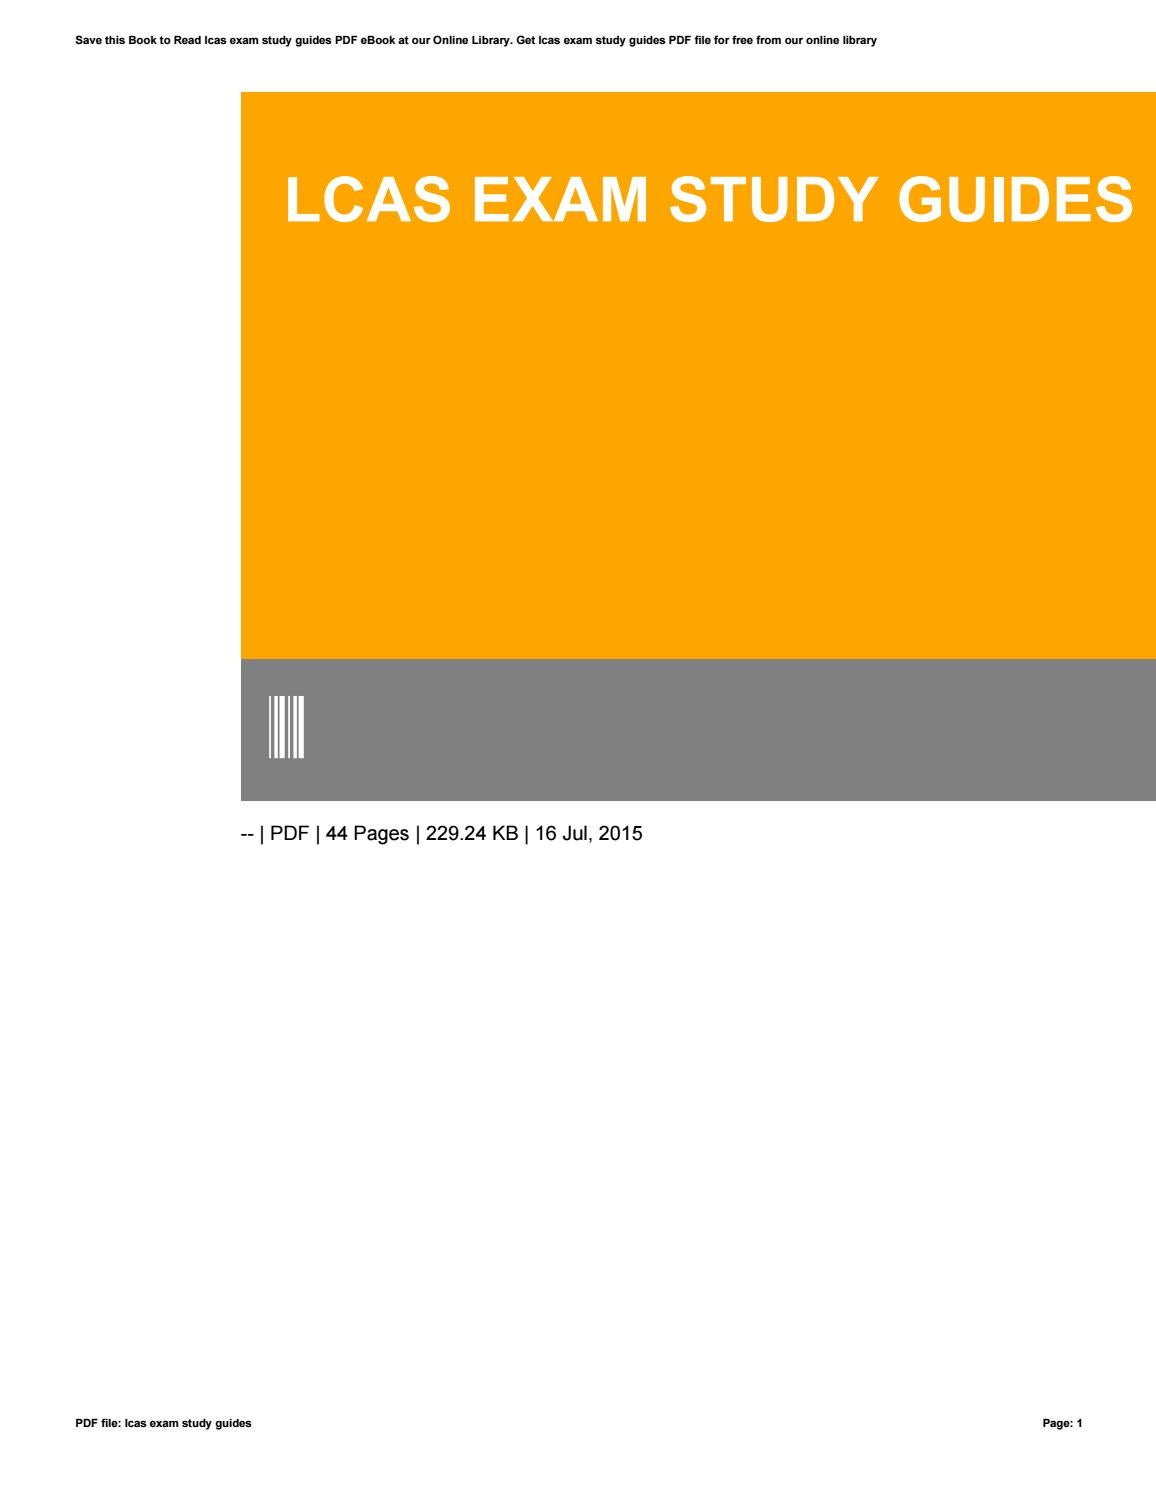 lcas exam study guides by t642 issuu rh issuu com nc lcas exam study guide cas exam 5 study guide